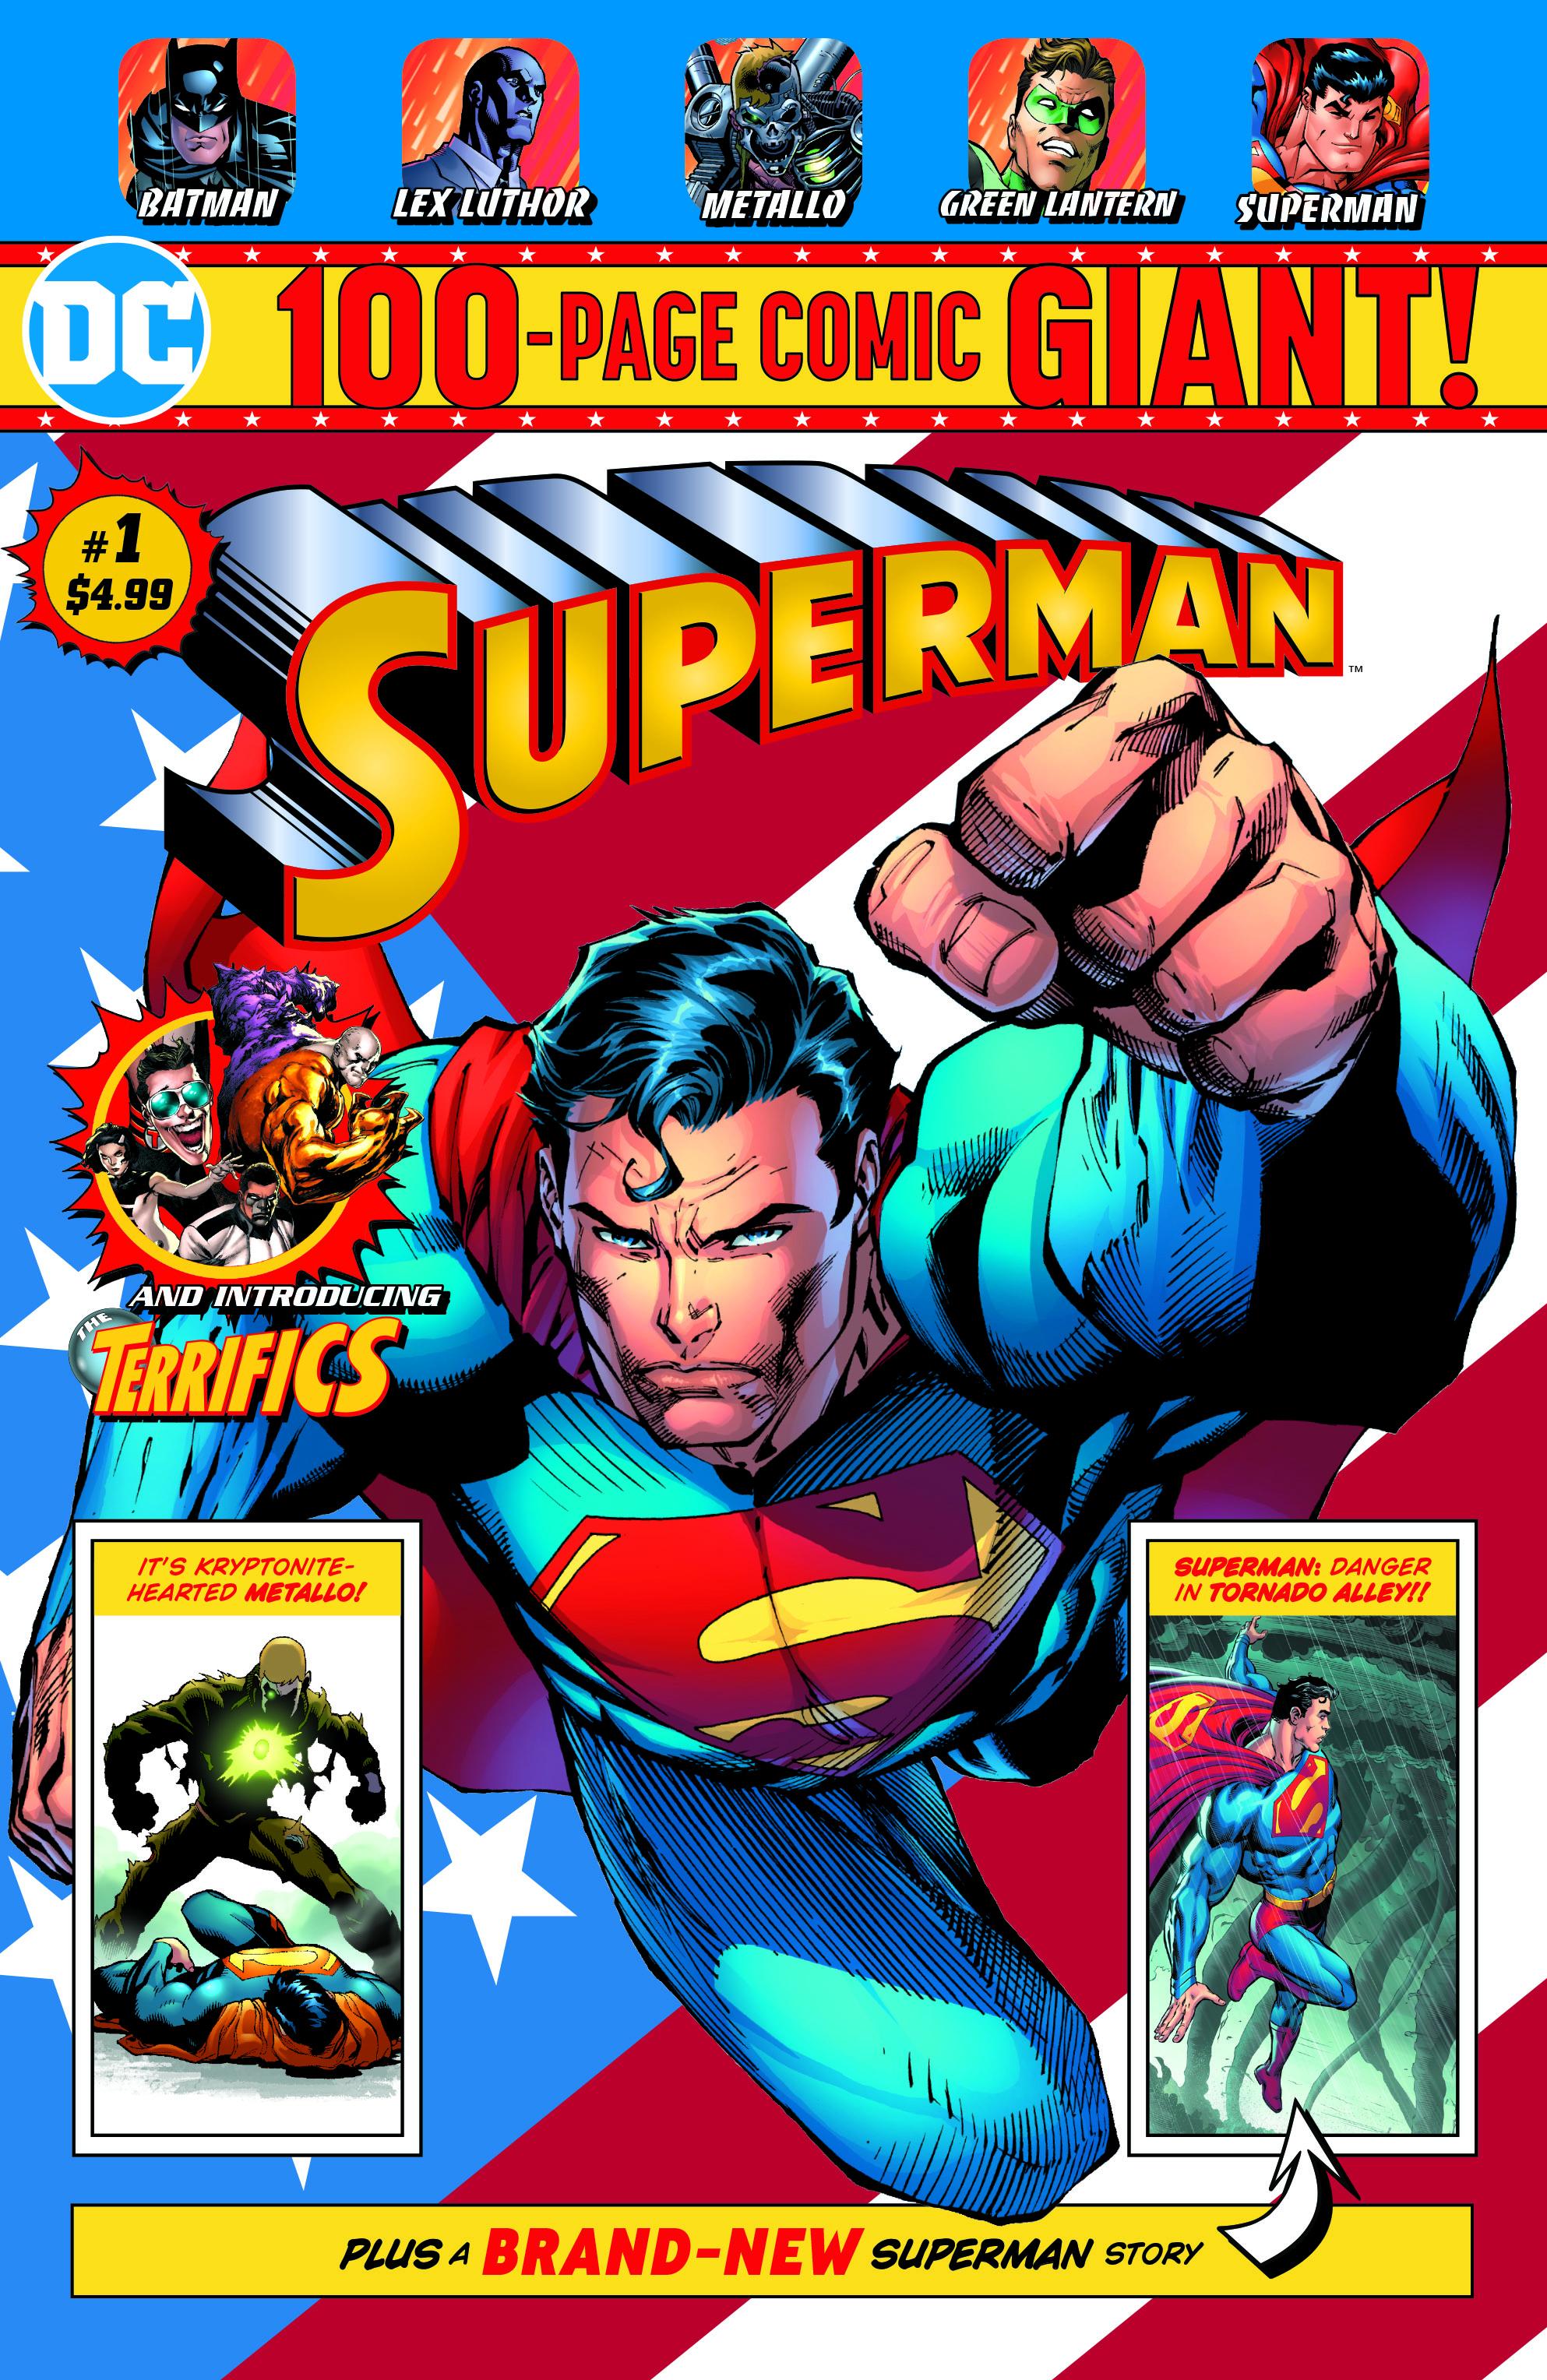 dc_100_page_walmart_comic_superman.jpg